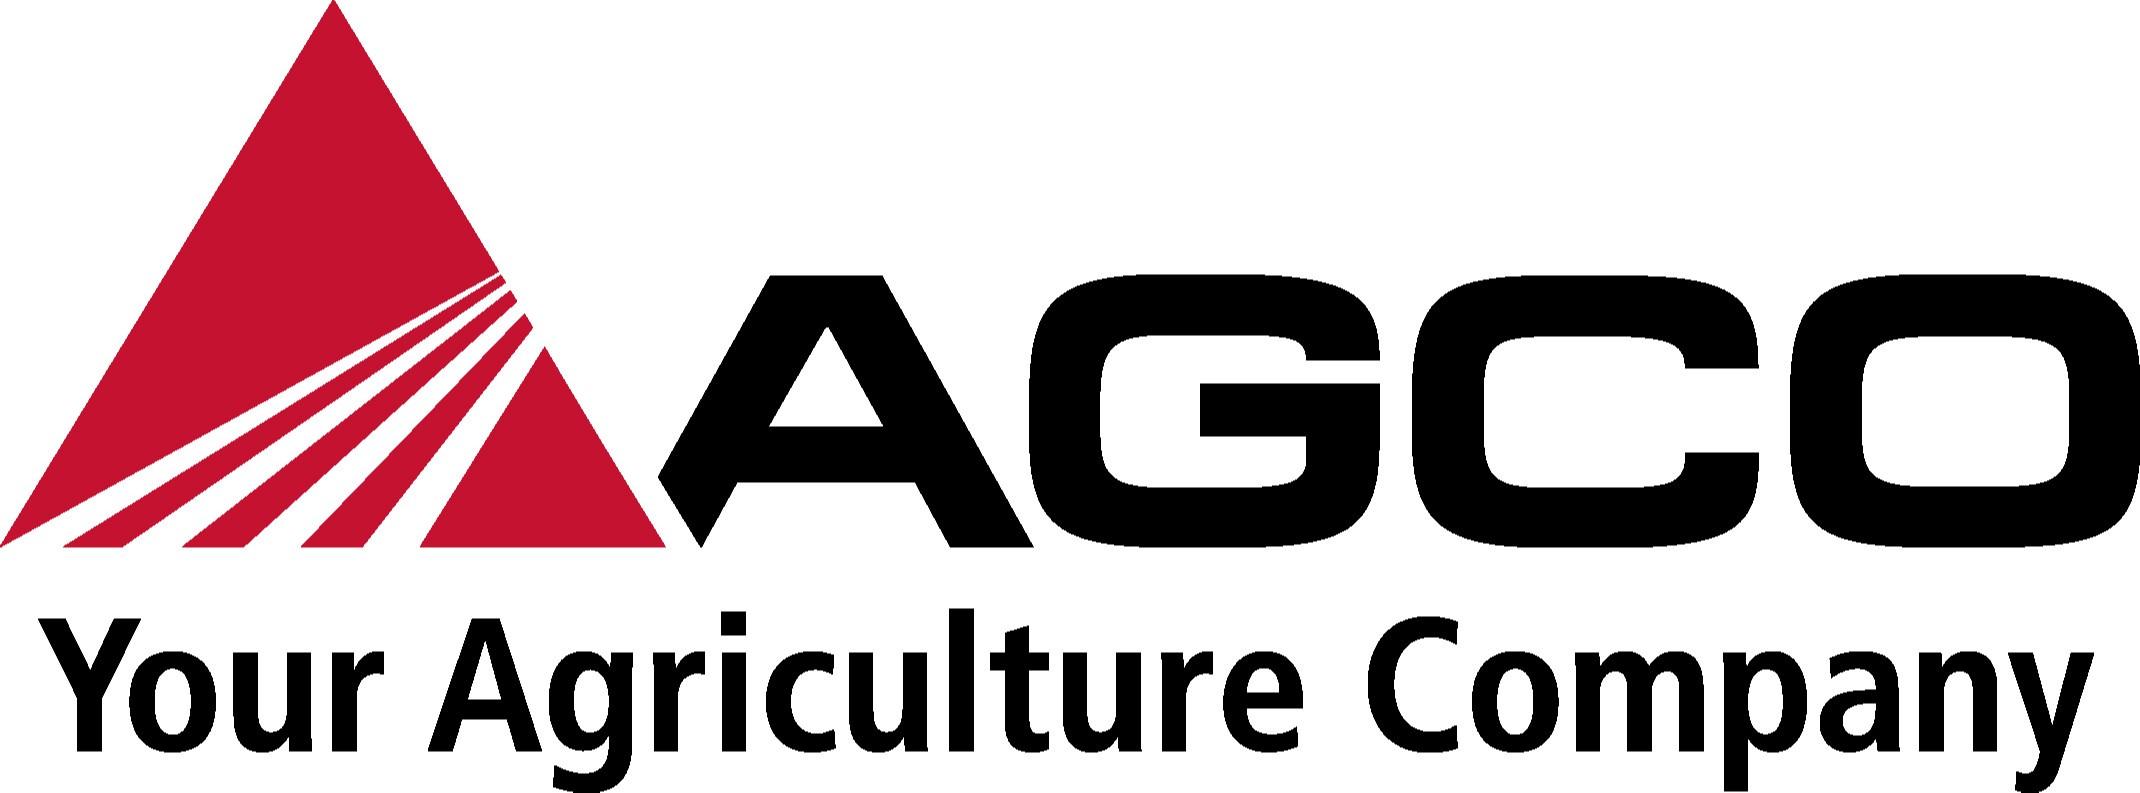 AGCO Australia/New Zealand logo